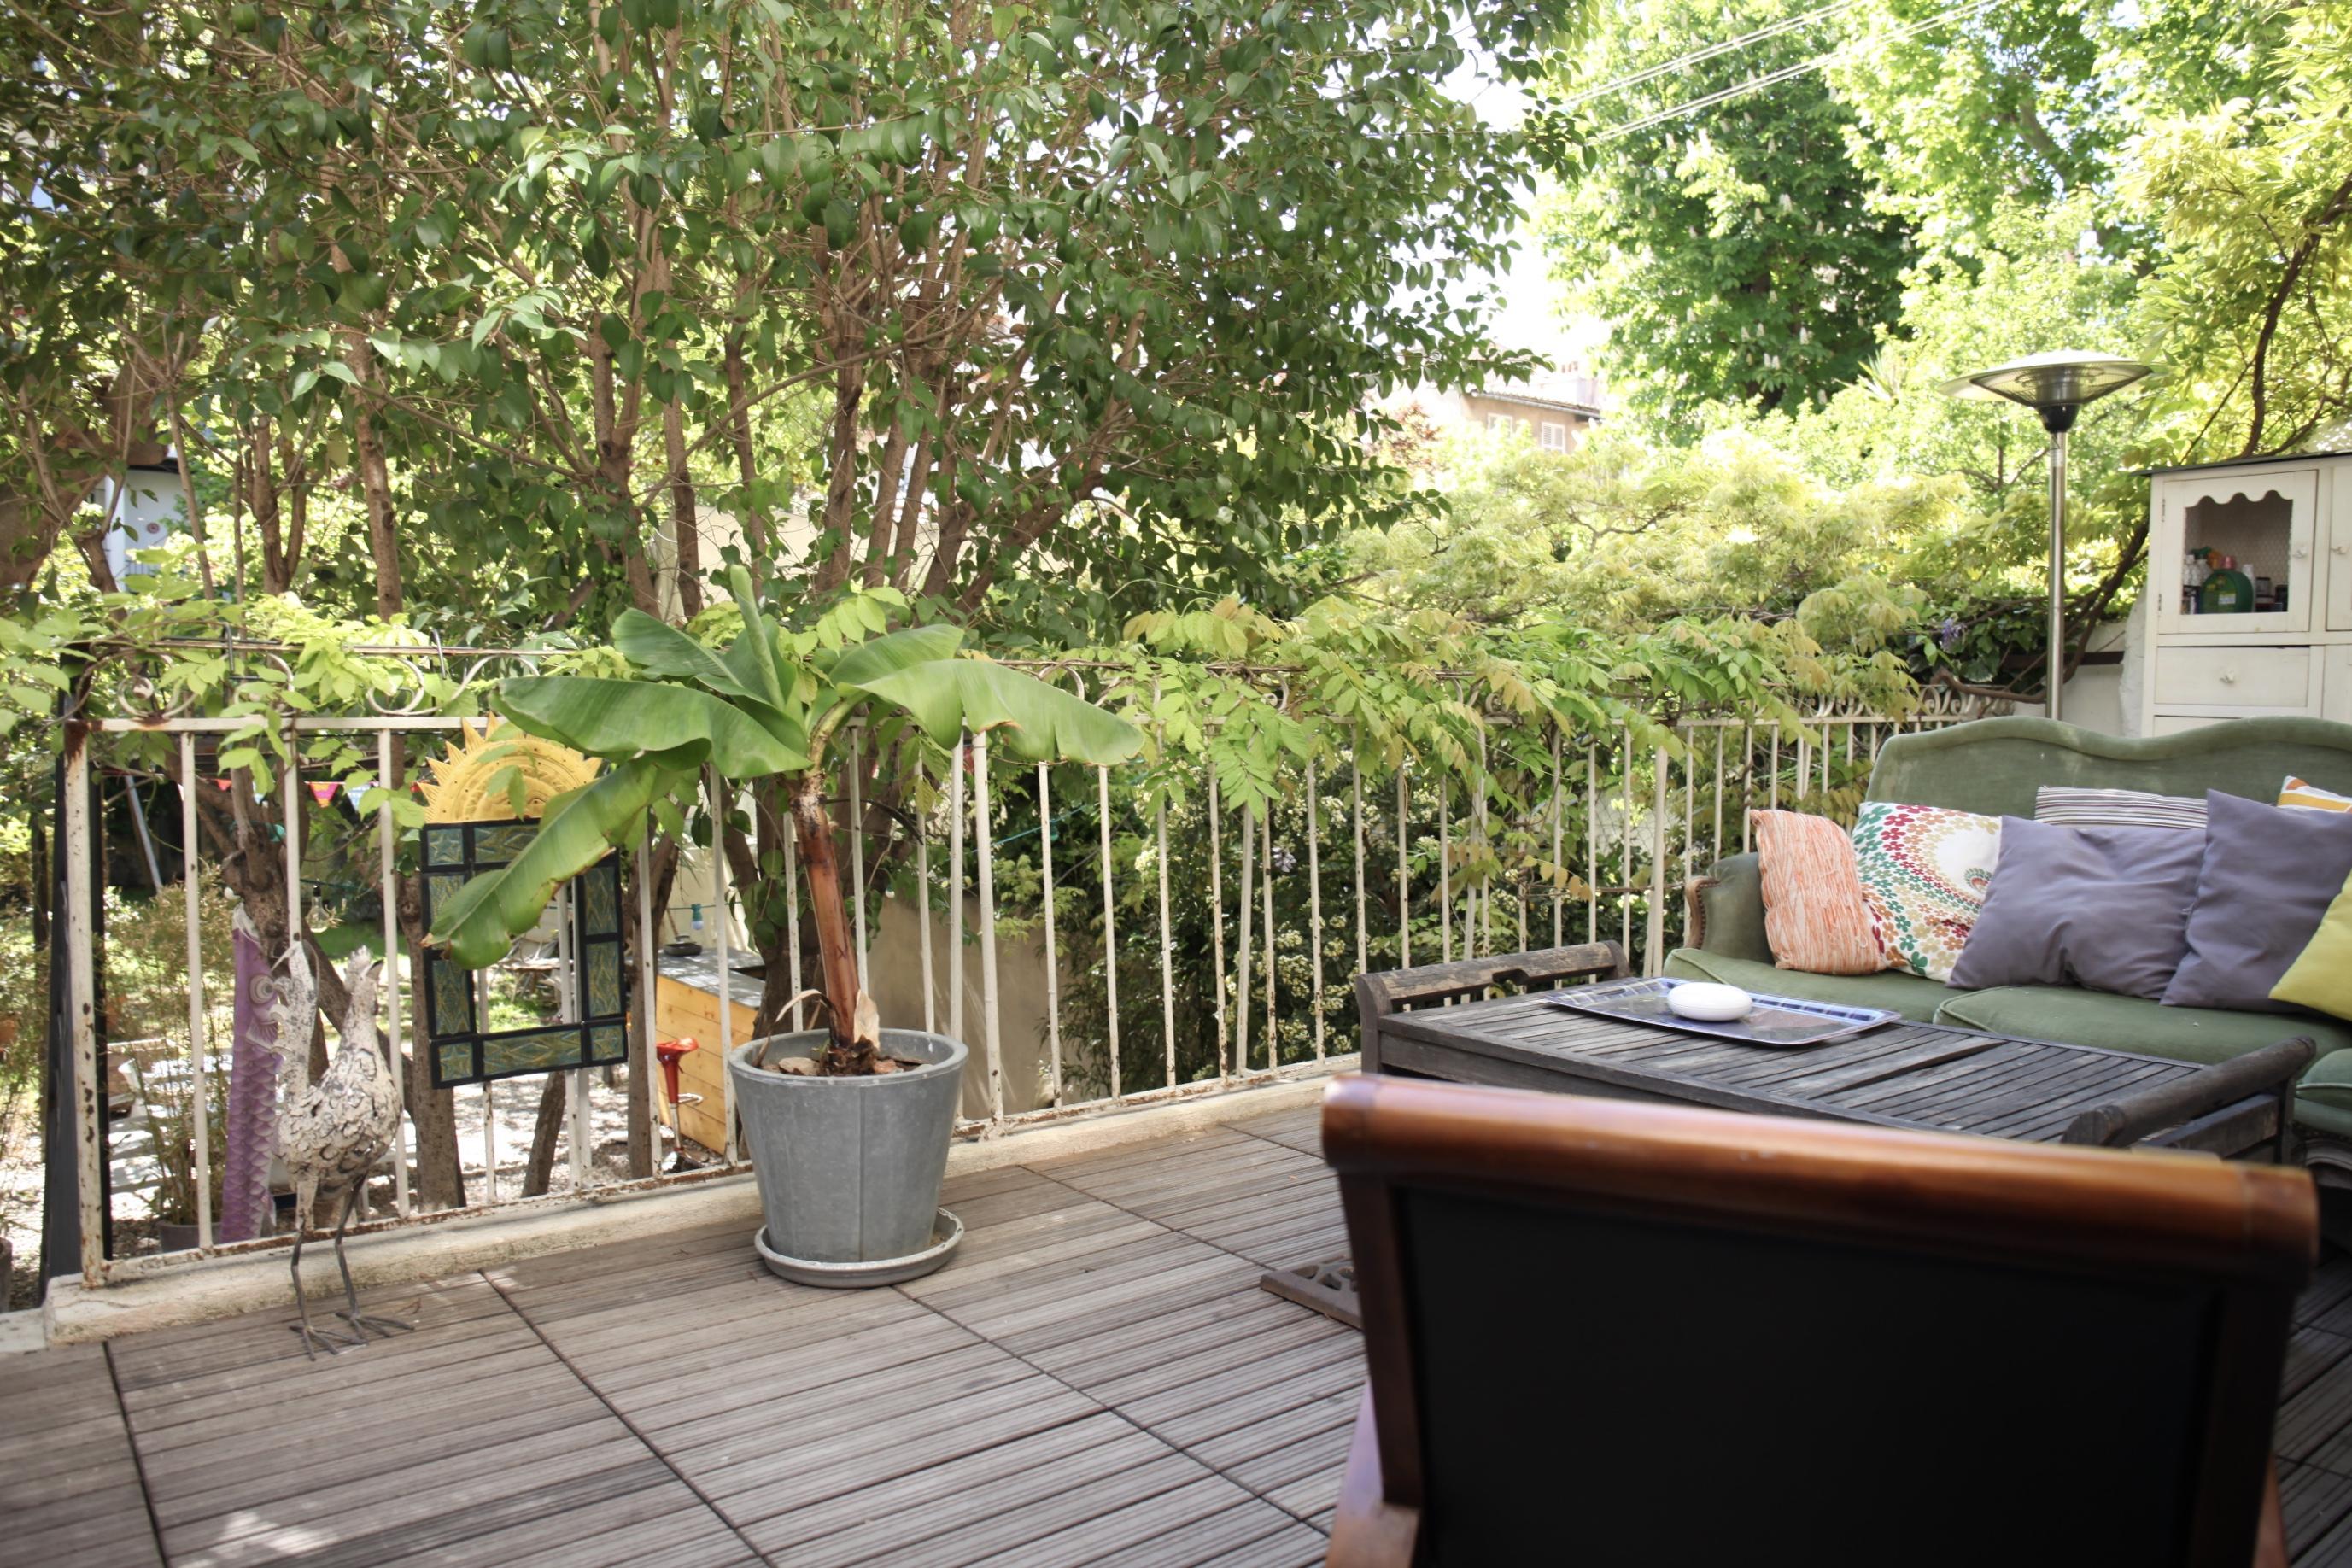 VENDU -6e- ND du mont - Duplex T5 avec terrasses & grand jardin - 545 000 €